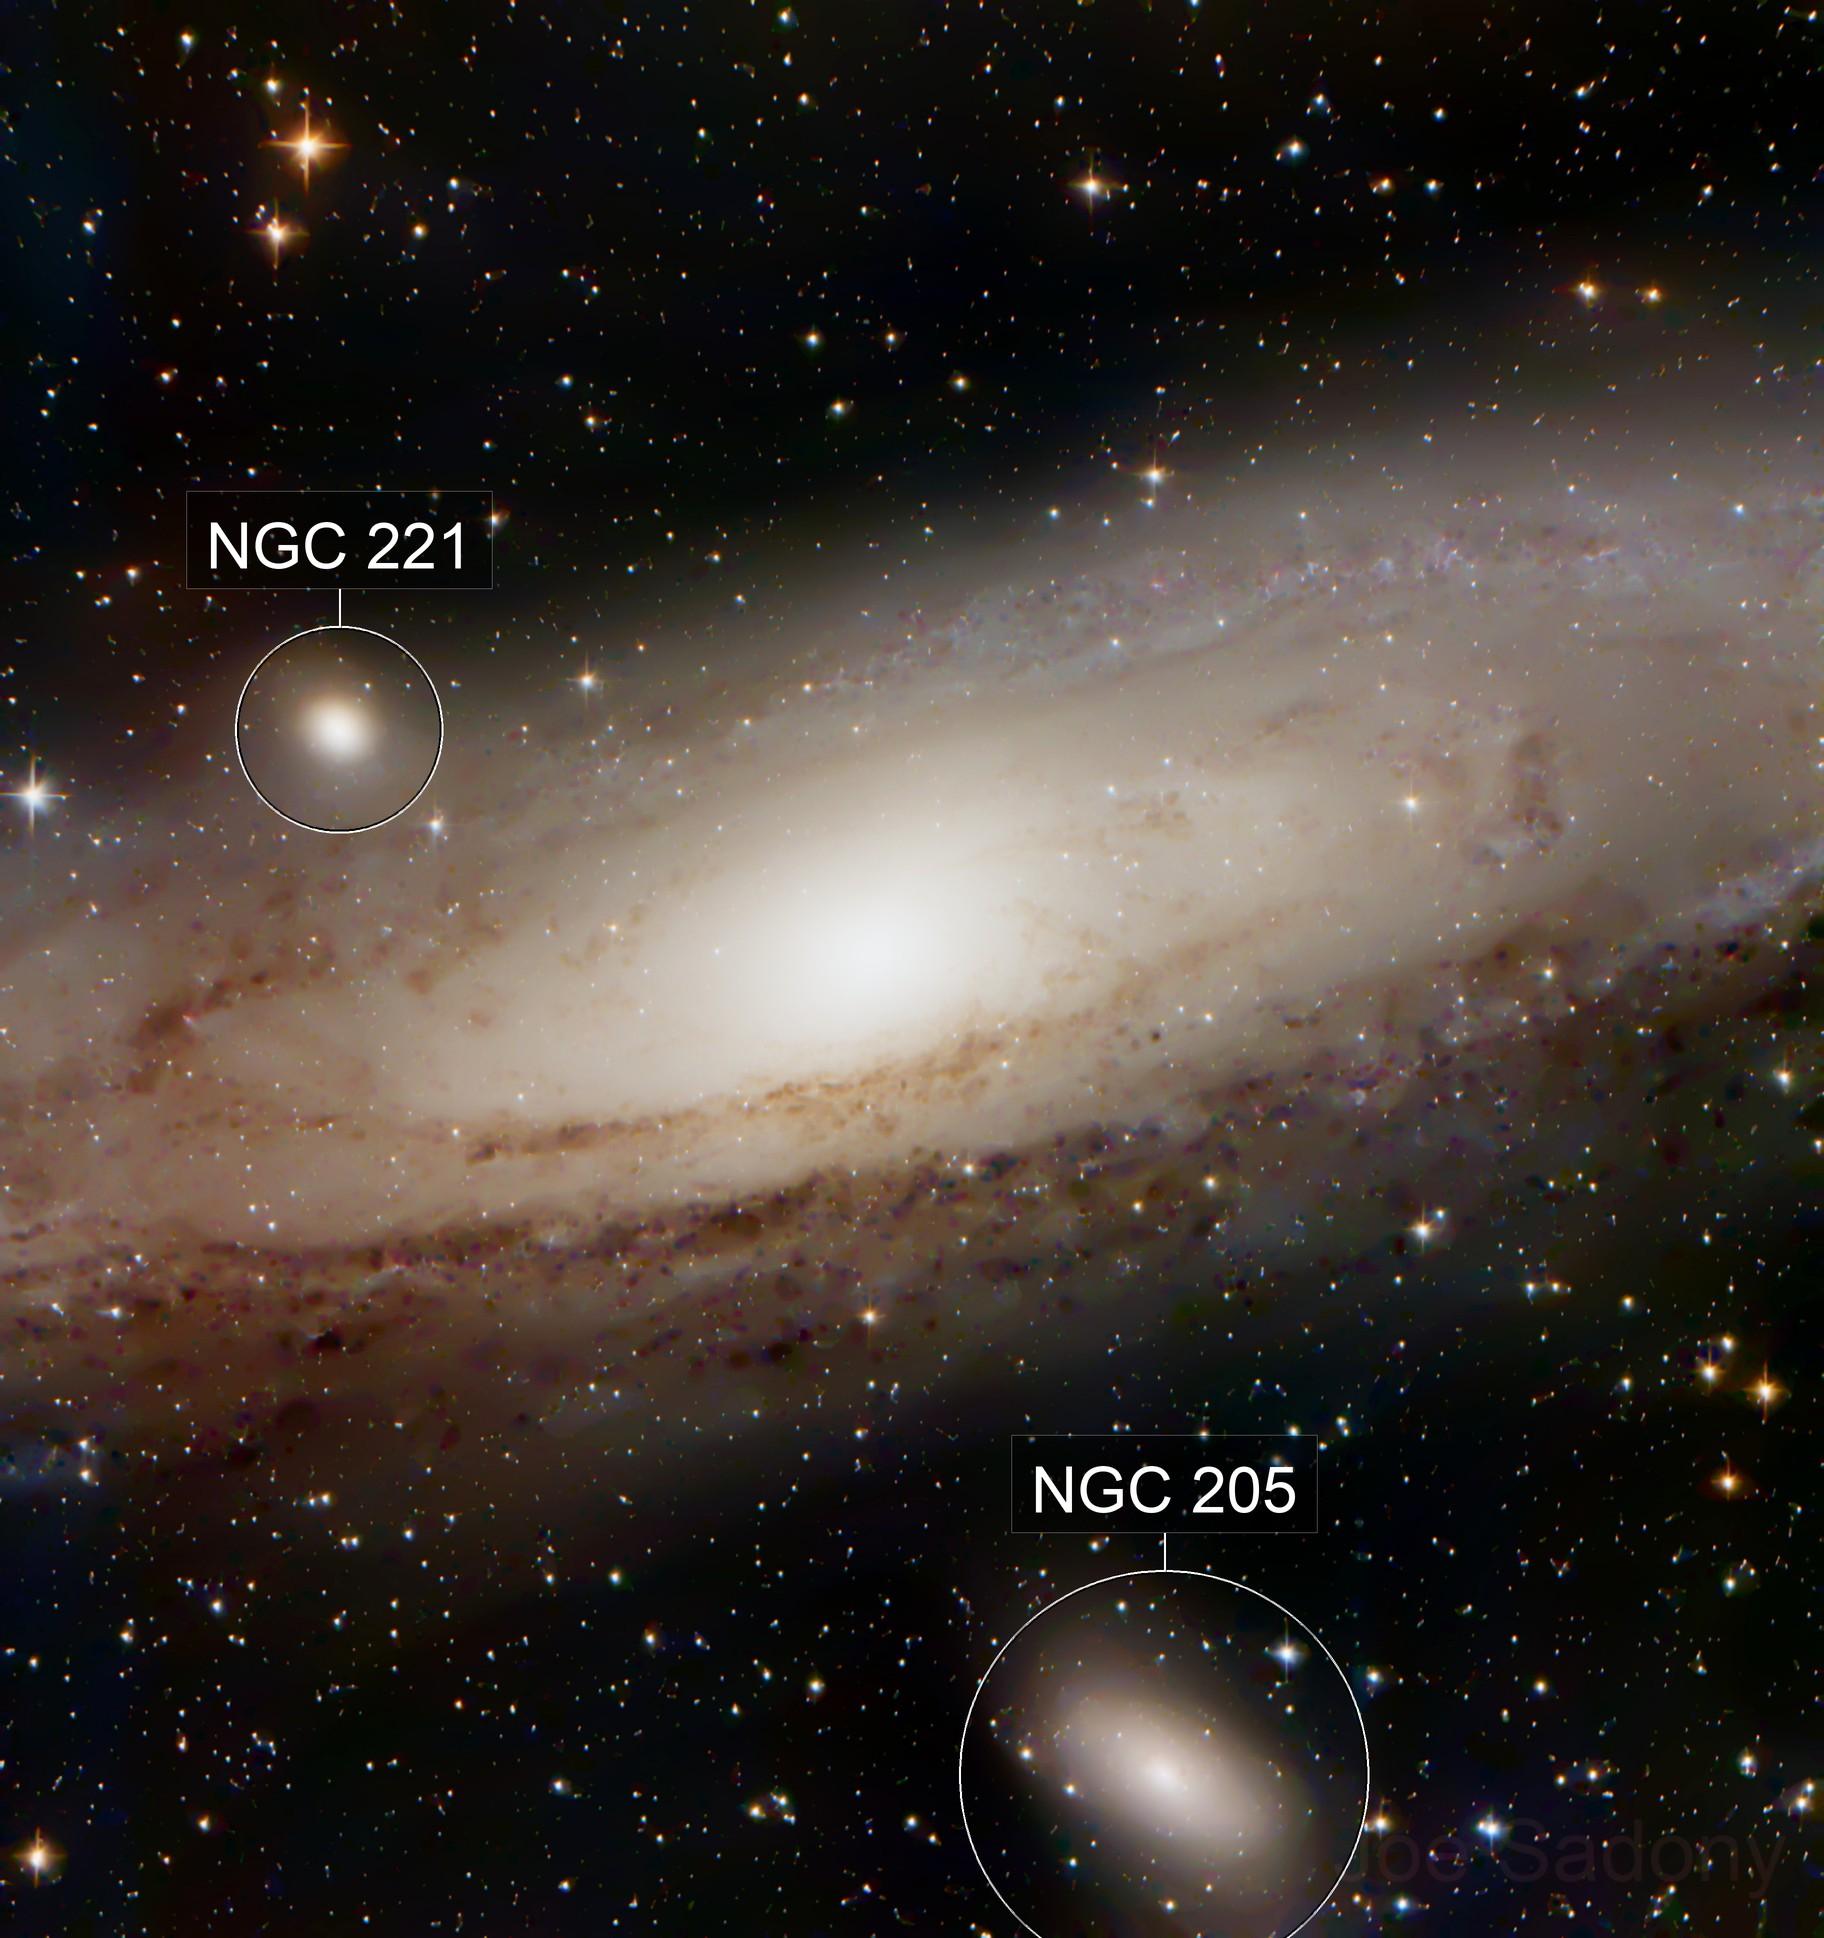 M31 - Andromeda on 7/21/20